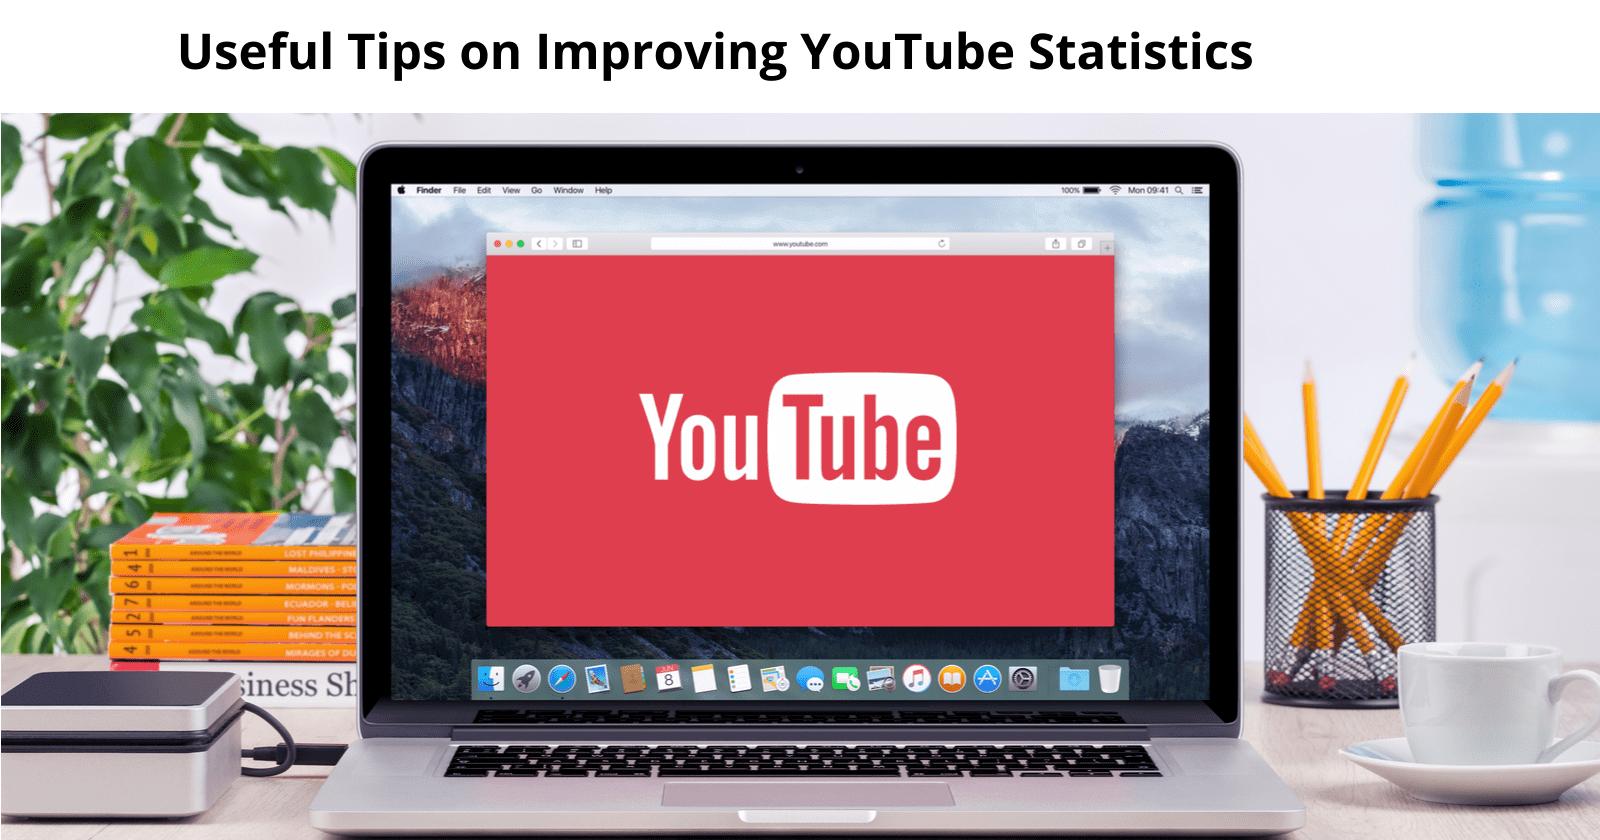 Improving YouTube Statistics